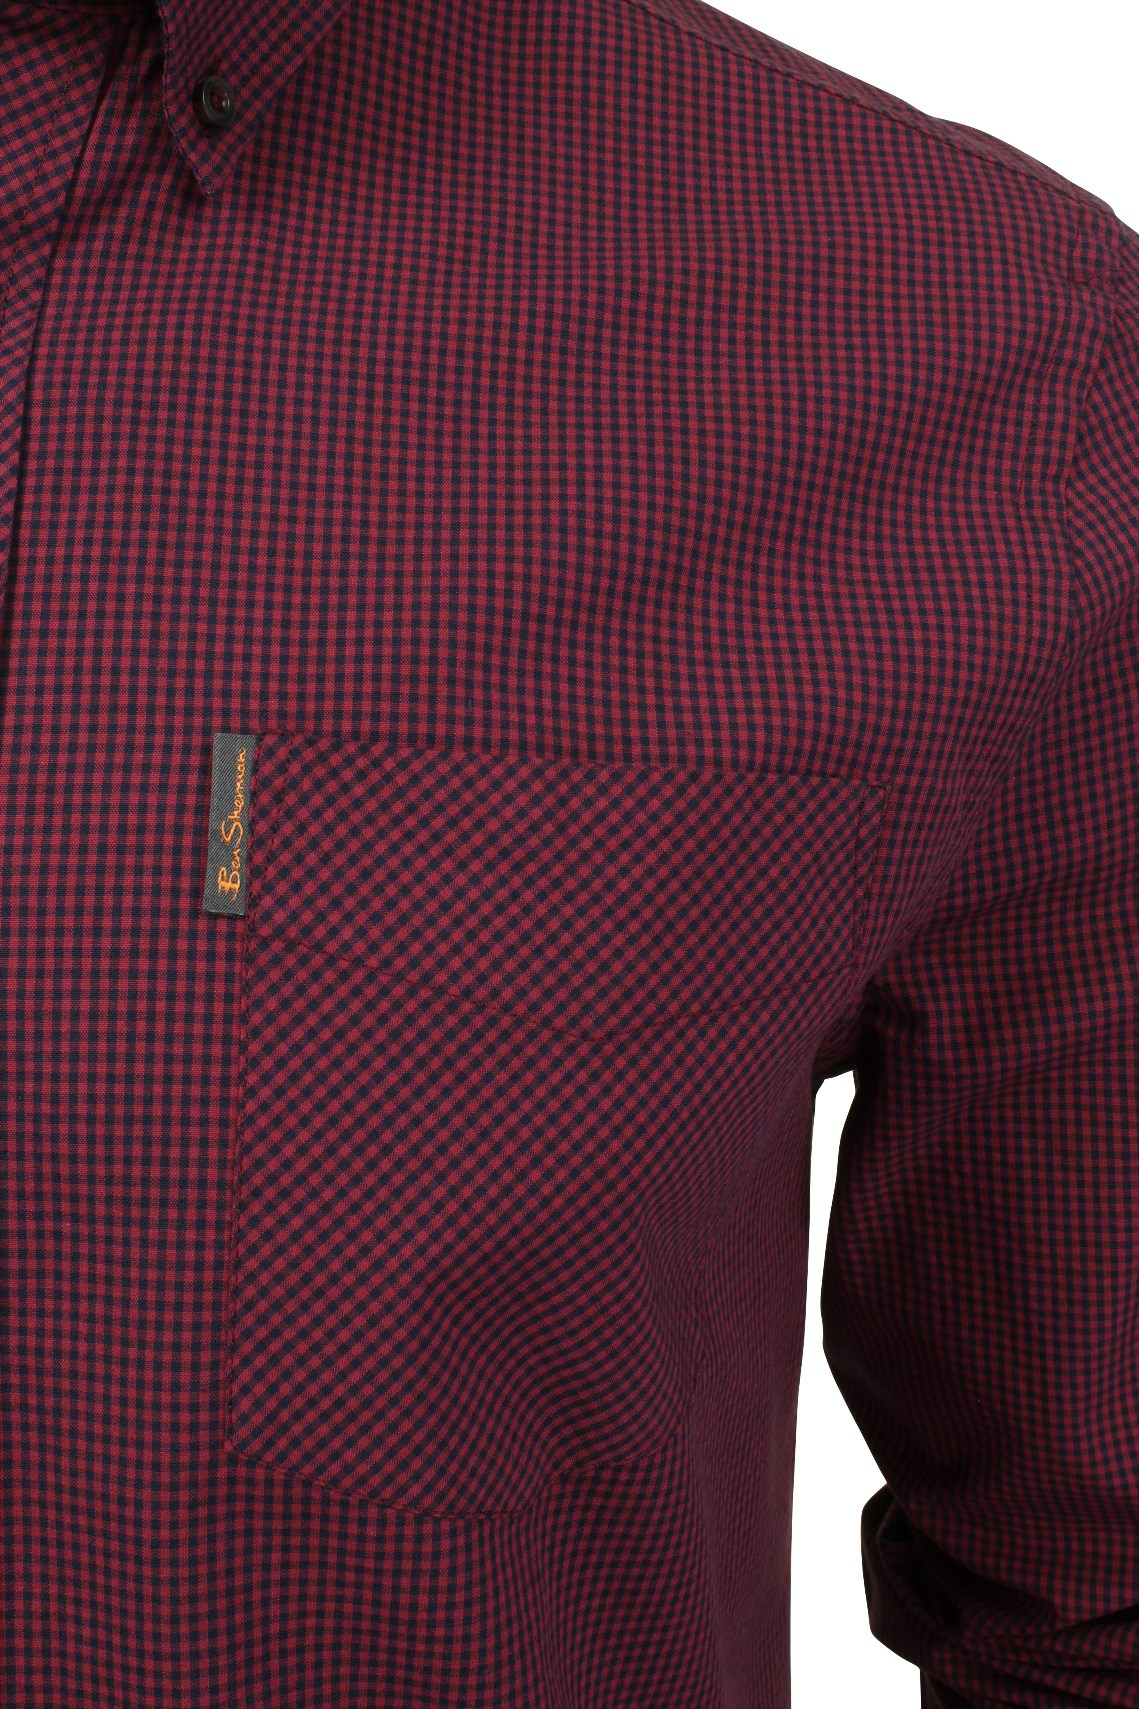 Mens-Classic-Gingham-Shirt-by-Ben-Sherman-Long-Sleeved thumbnail 13